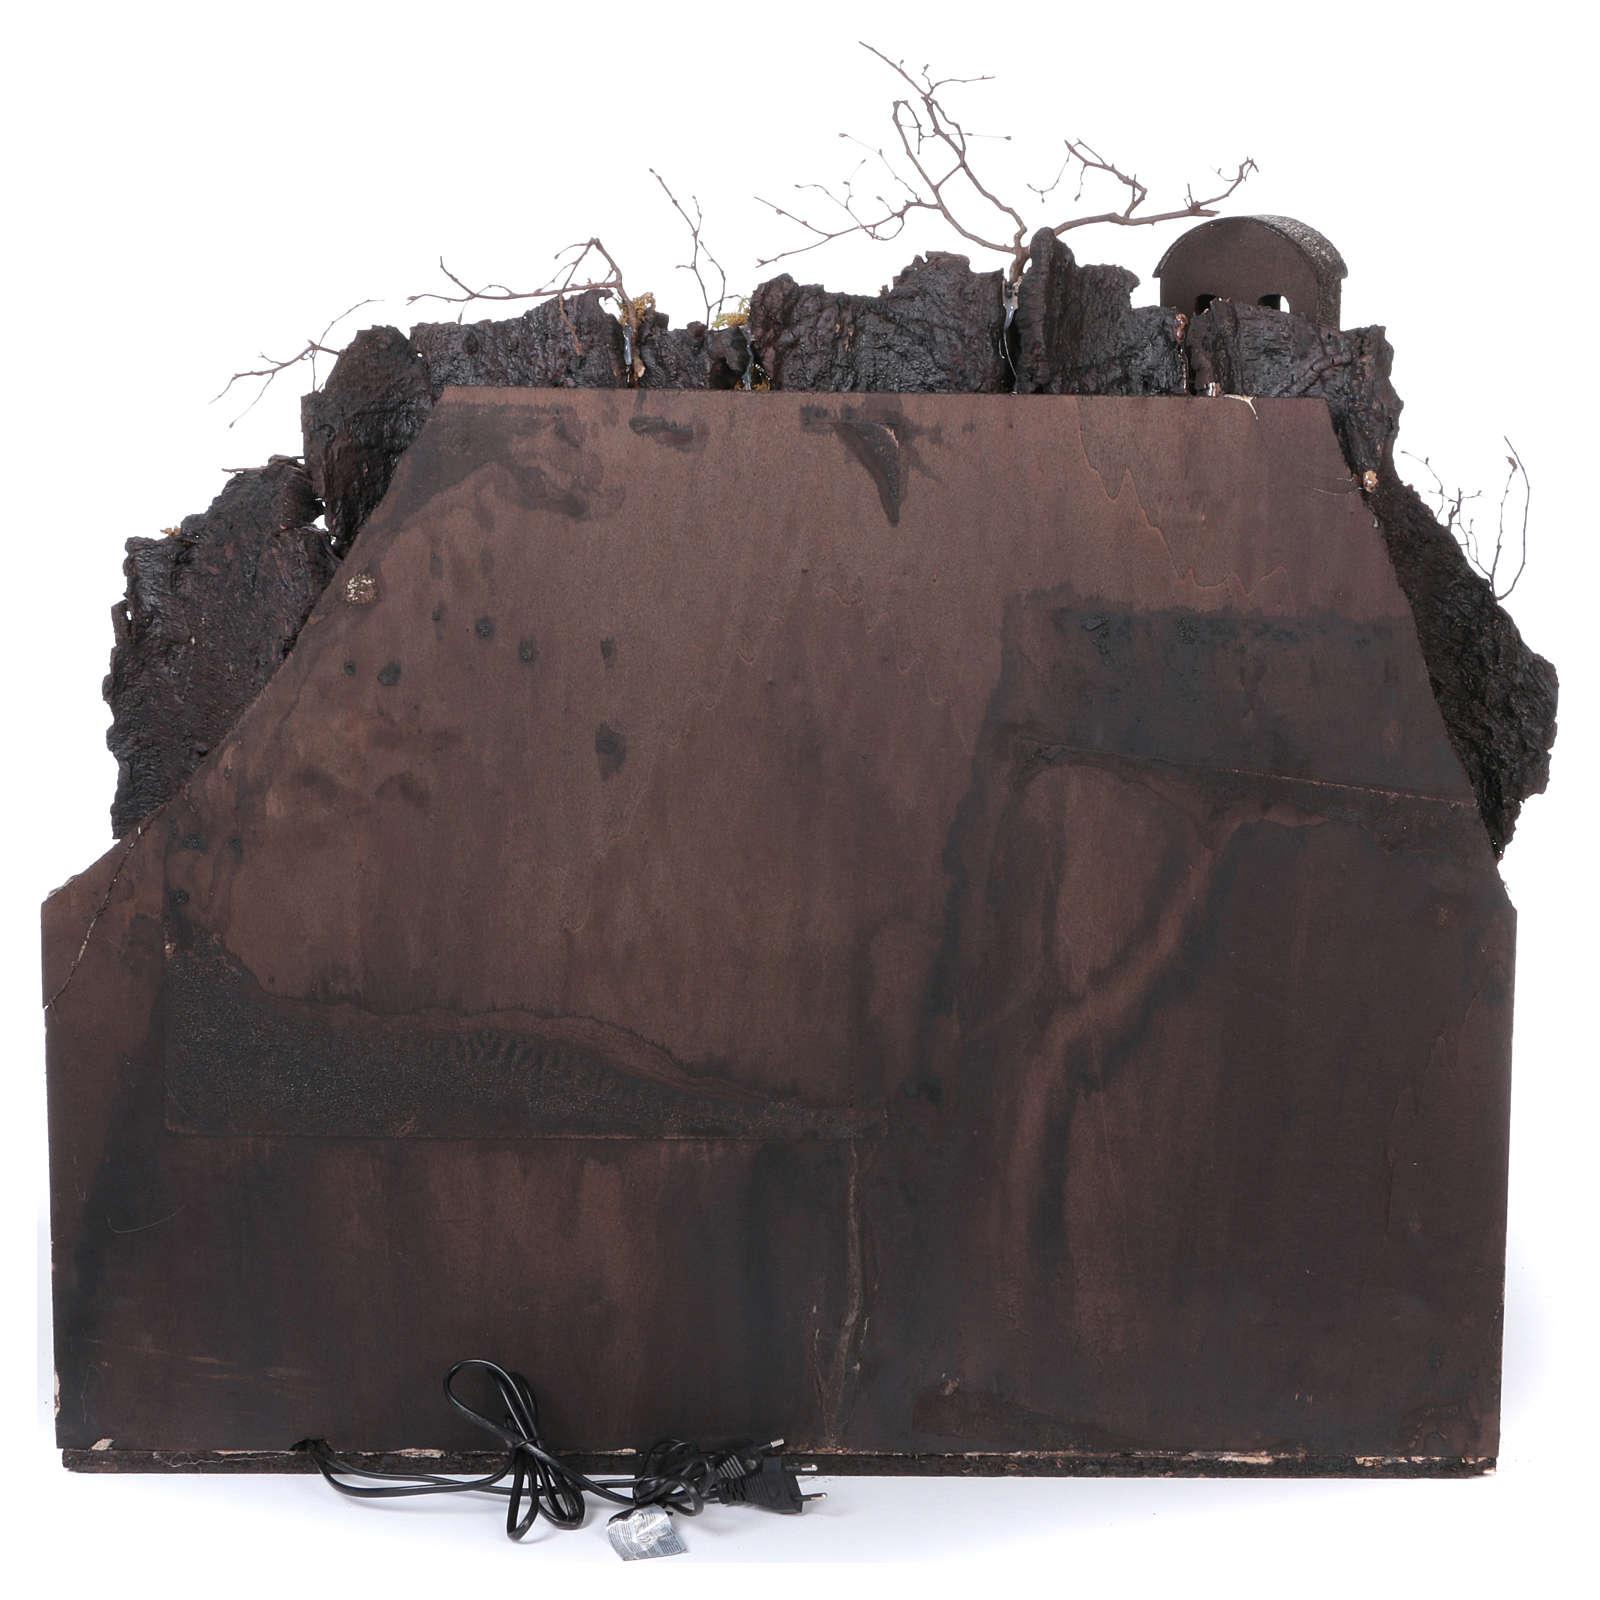 Aldea antigua con cascada y molino para belén 70x80x60 cm estilo napoletano 700 4